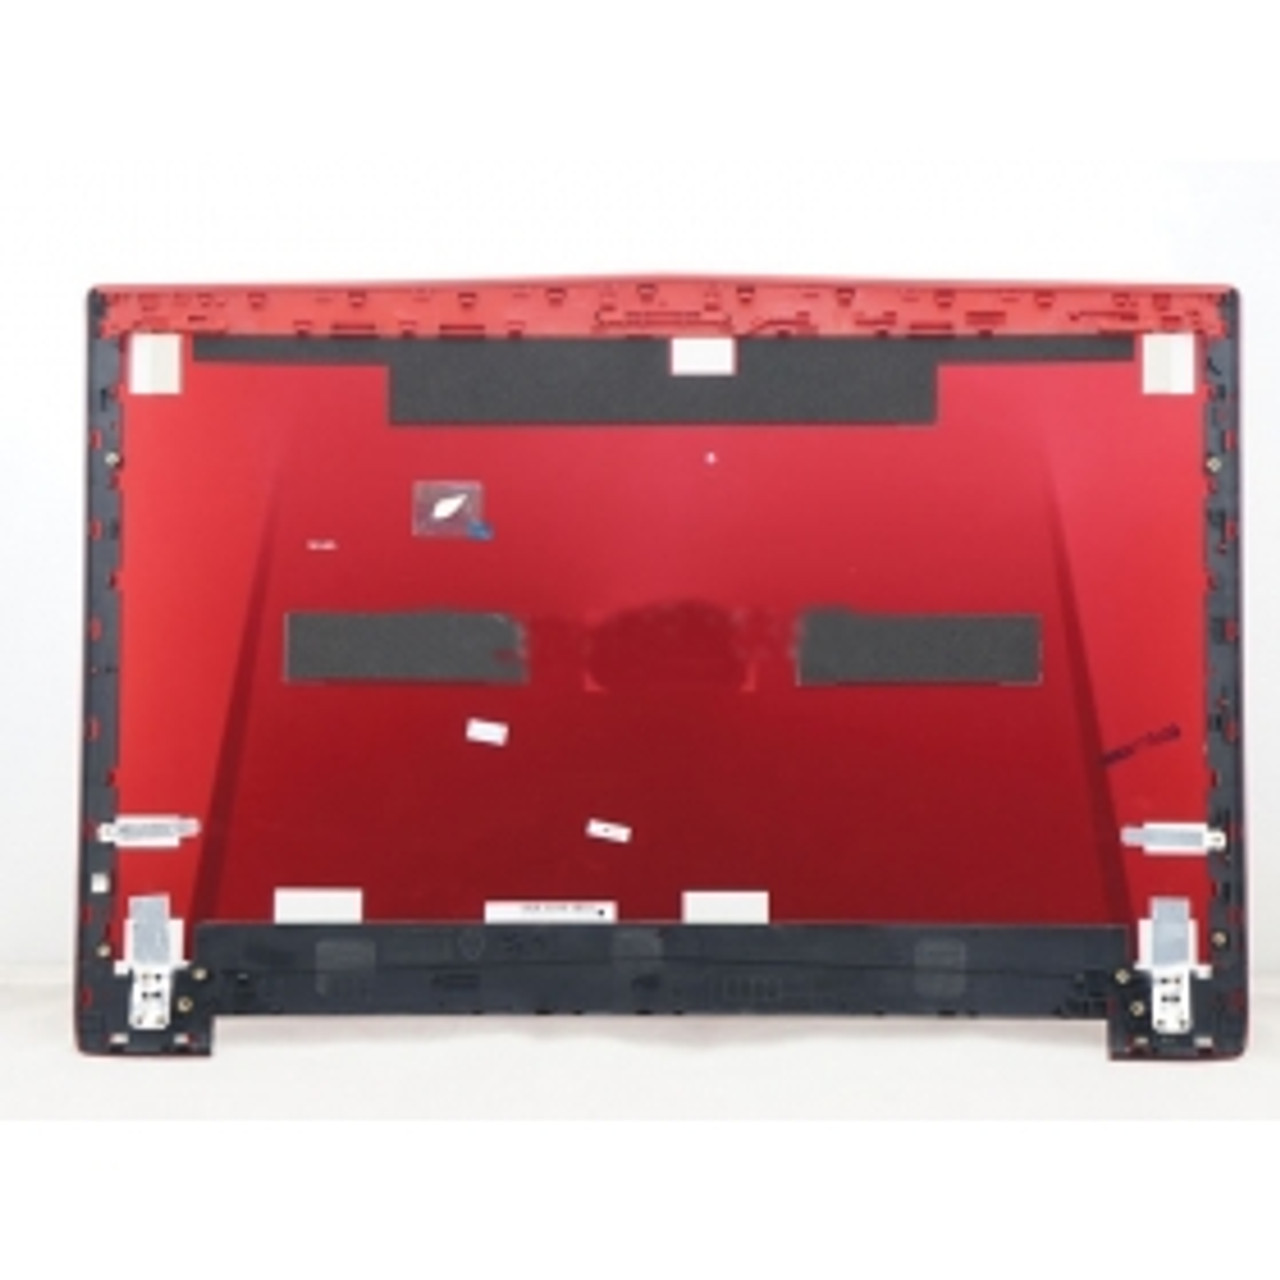 Laptop Bottom Case for MSI GT72 GT72S GT72VR MS-1781 MS-1782 307782D523P Black